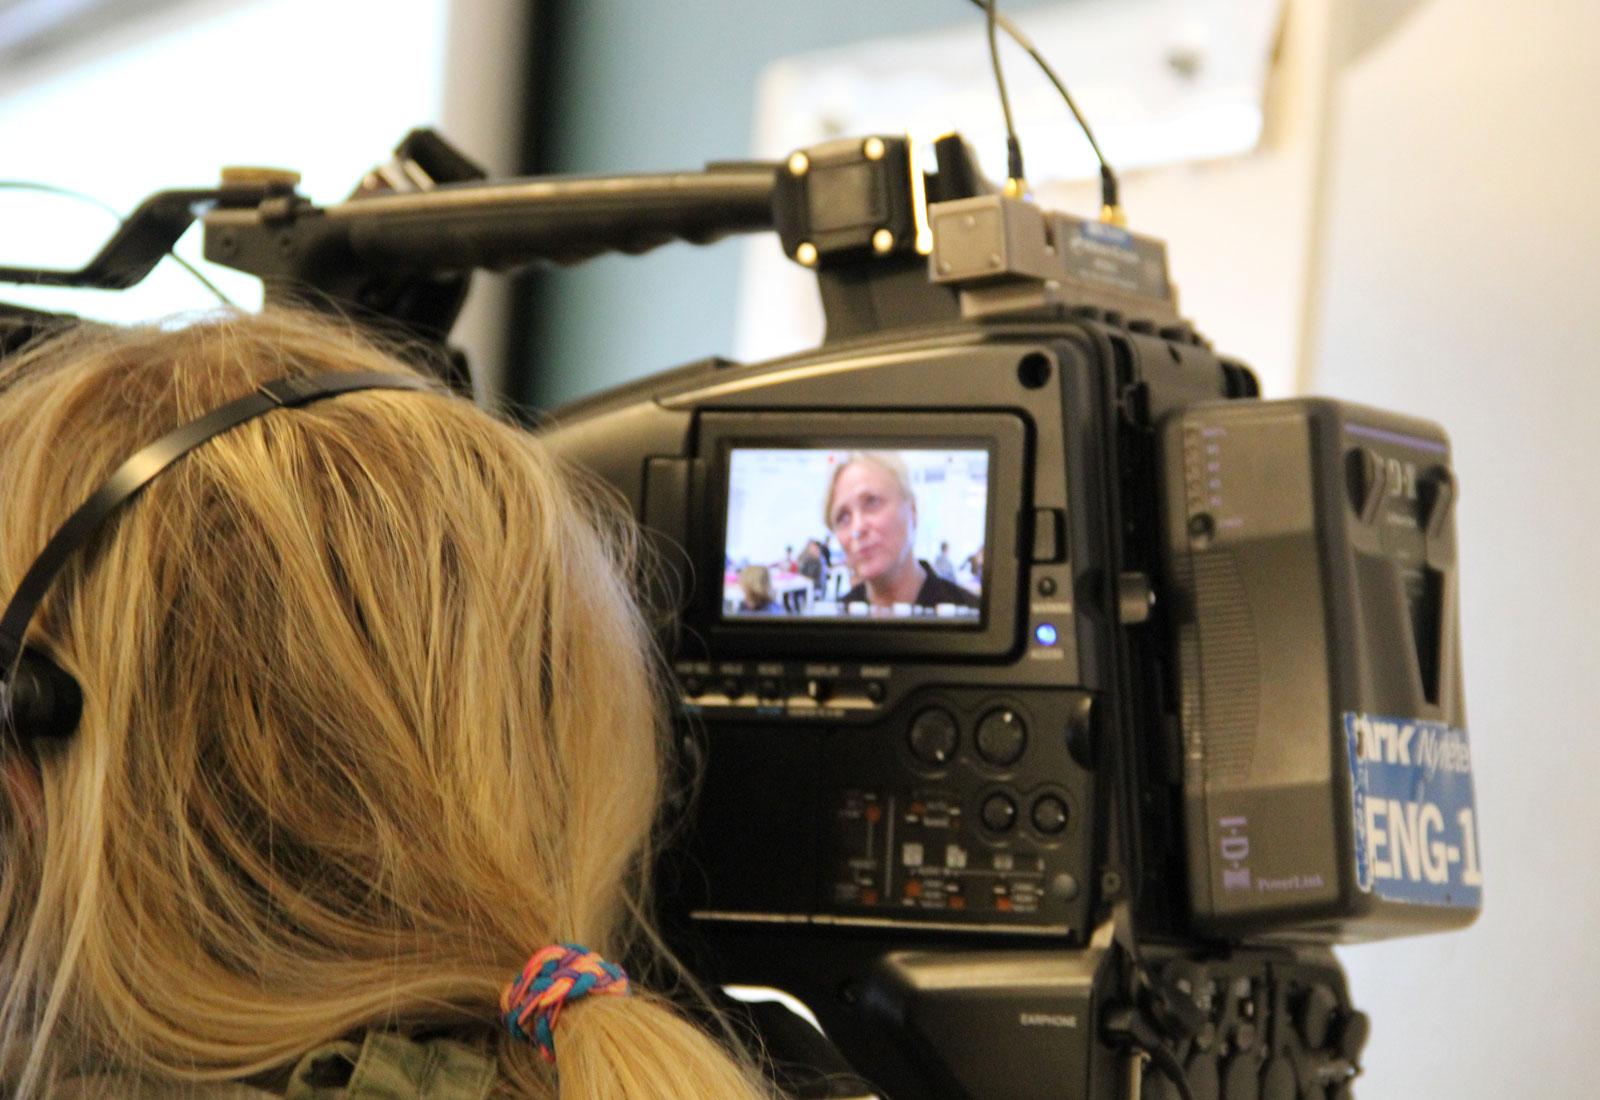 Bilde fra lanseringen av husfred.no – snakk om spill på Engebråten skole. Intervju med kulturminister Widvey